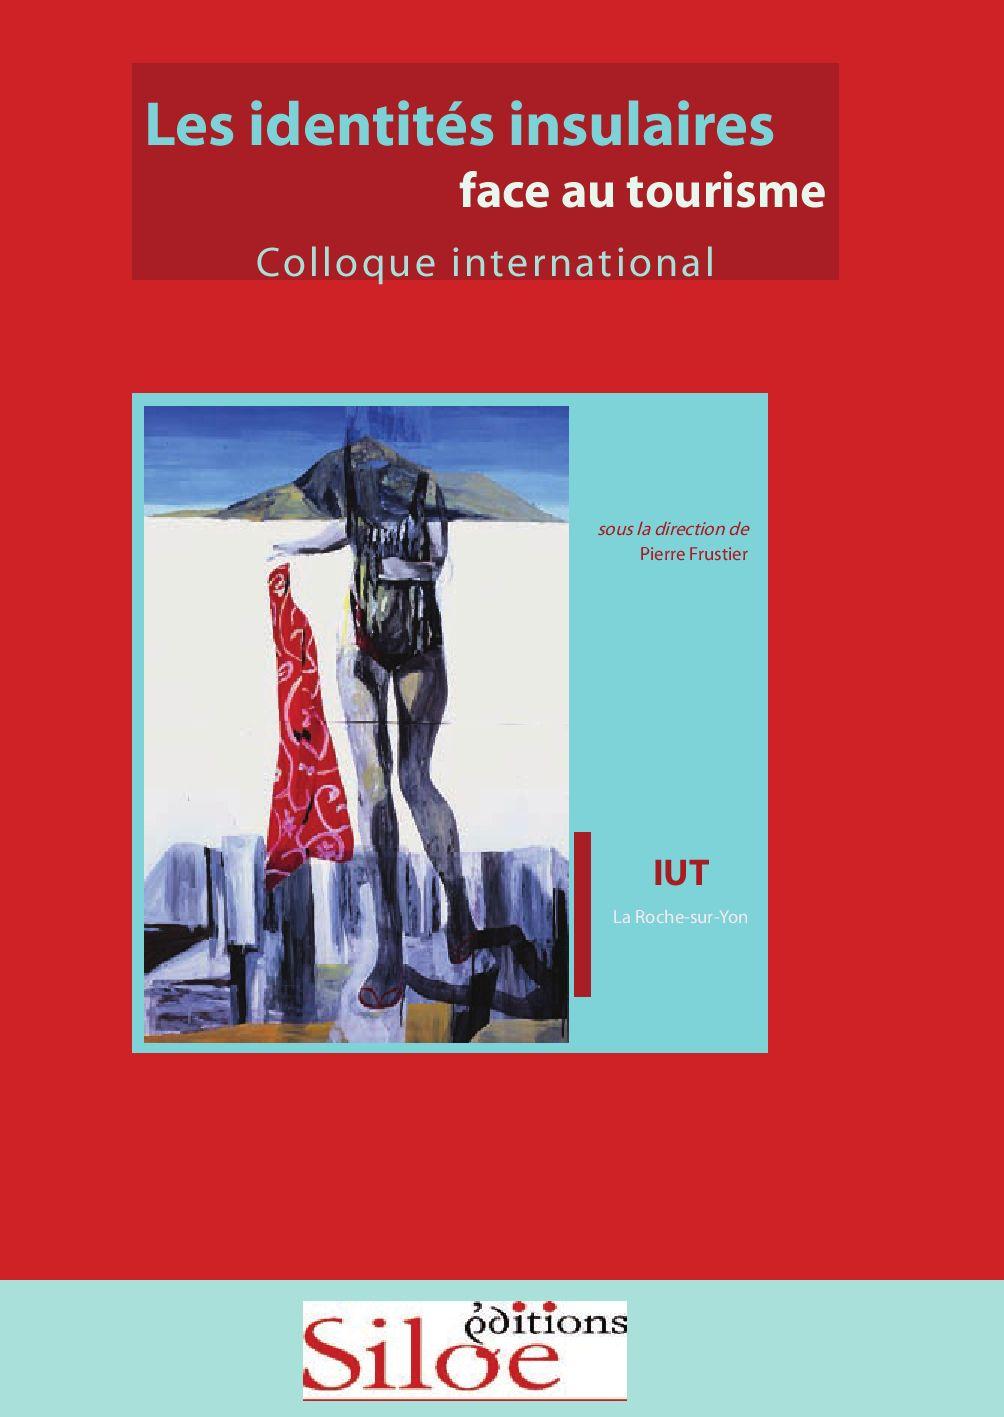 Colloque identités insulaires by olivierertzscheid - issuu 6636817a9e4